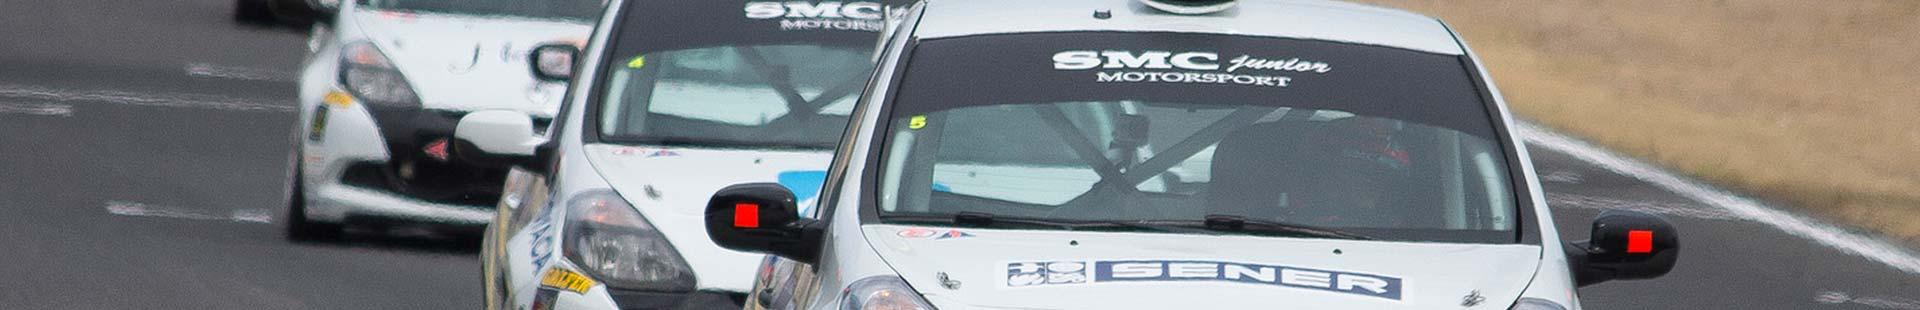 Pilotos Temporadas Anteriores SMC Junior Motorsport